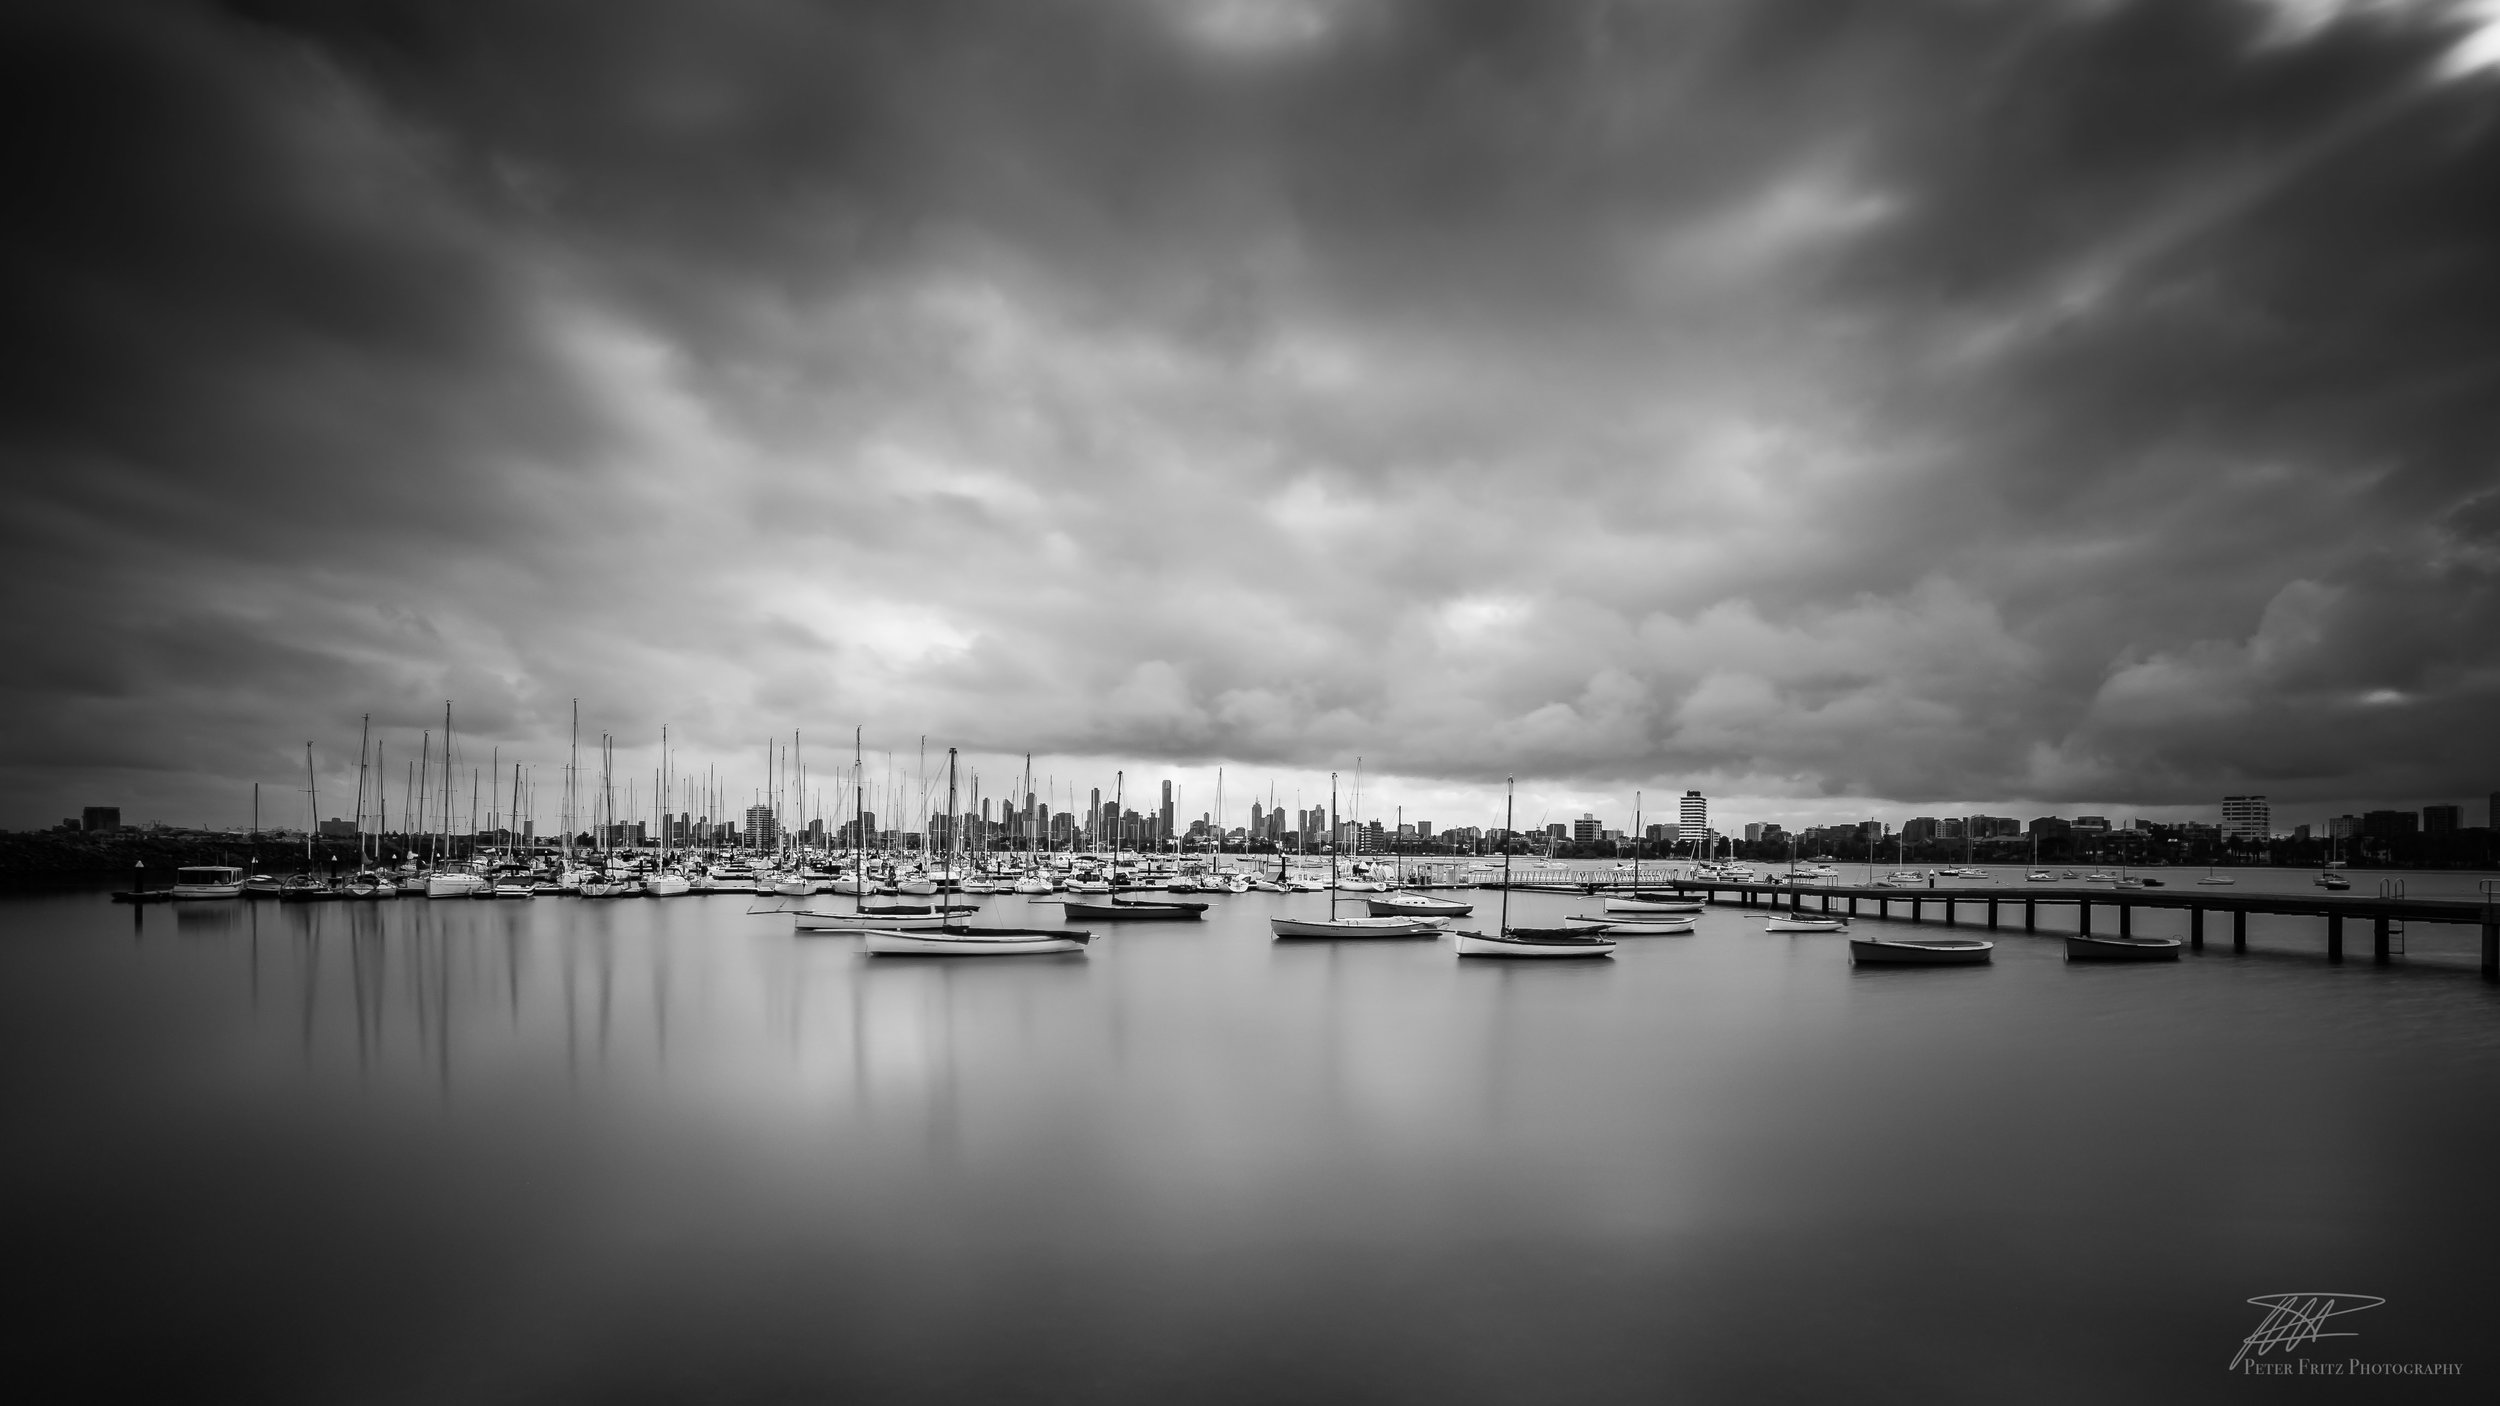 Copy of St Kilda Marina